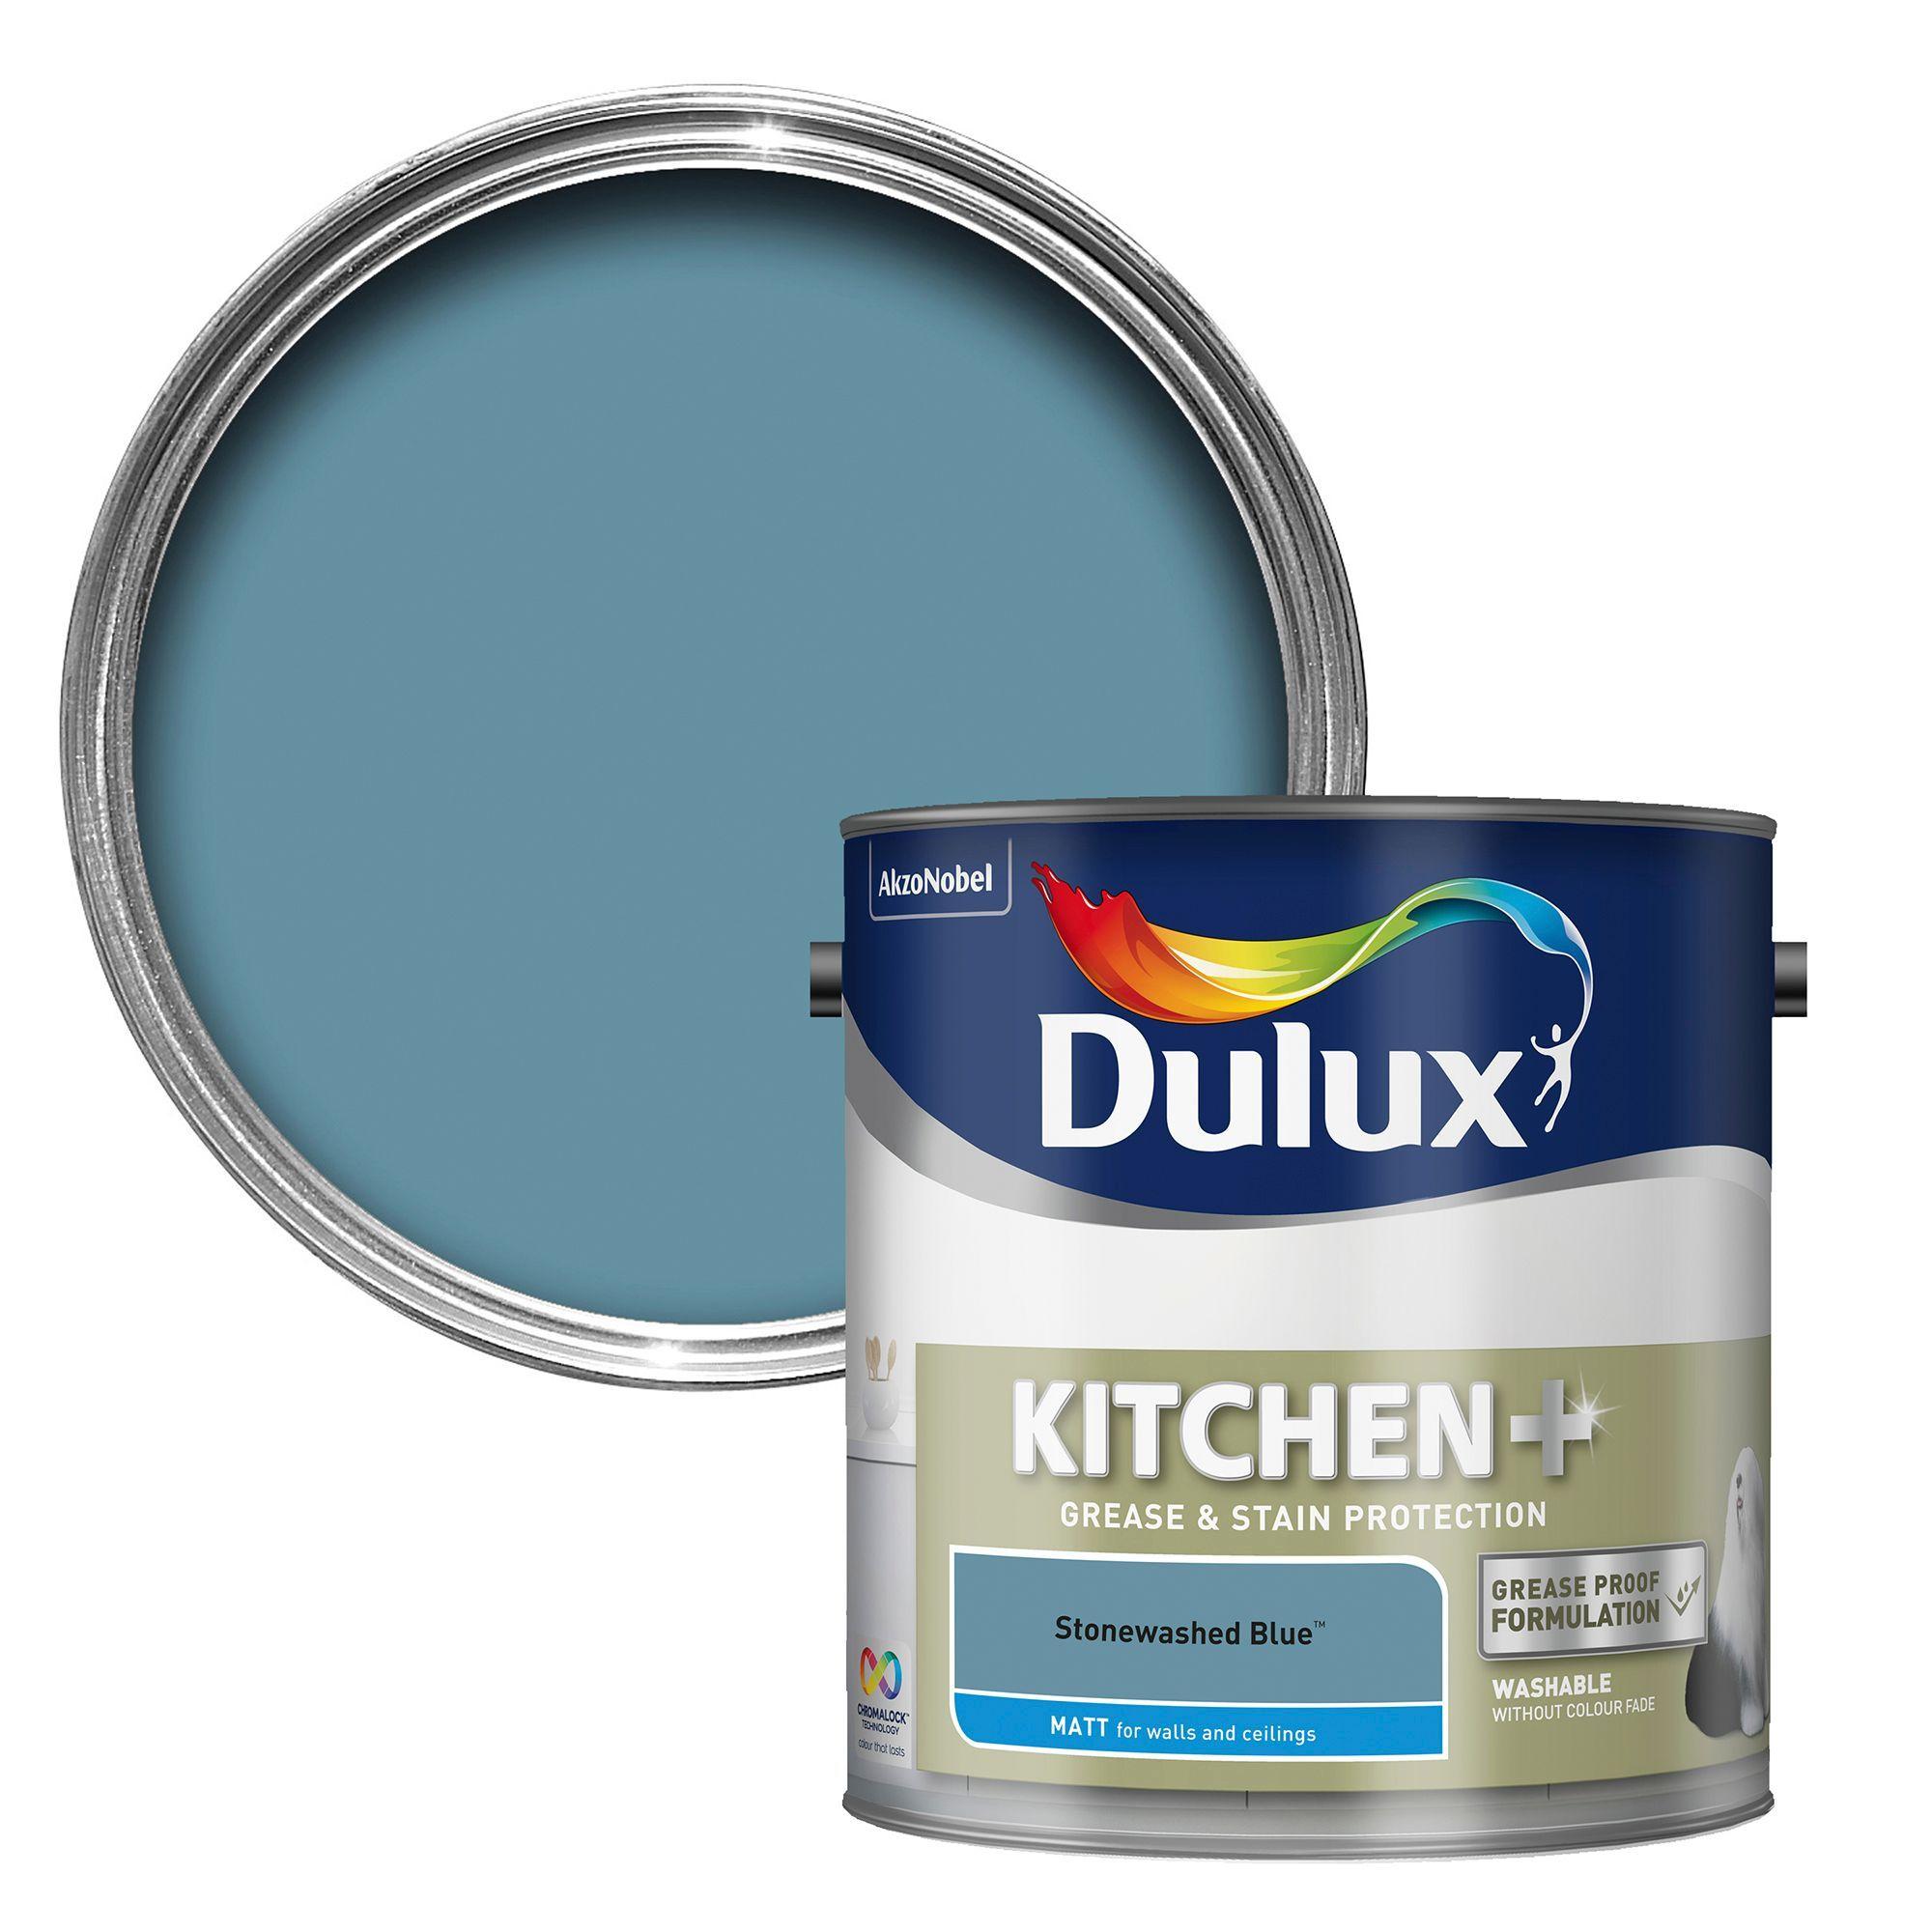 Dulux Kitchen Stonewashed Blue Matt Emulsion Paint 2.5L | Kitchens ...